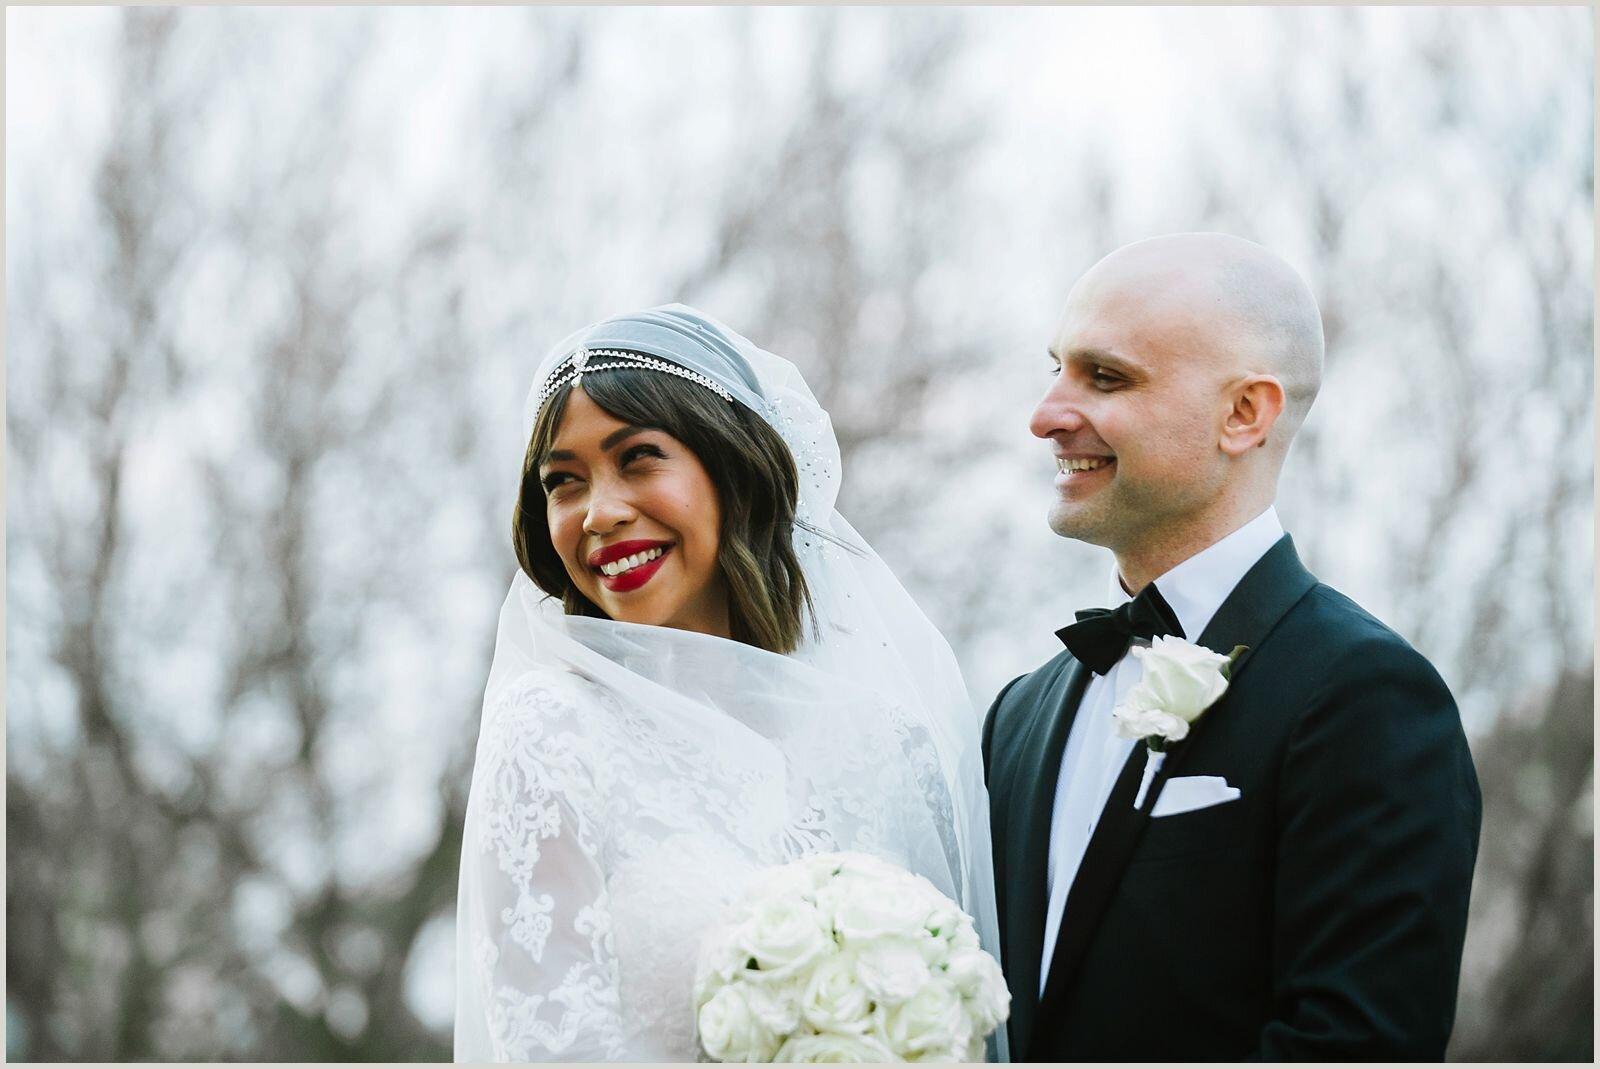 joseph_koprek_wedding_melbourne_the_prince_deck_0058.jpg